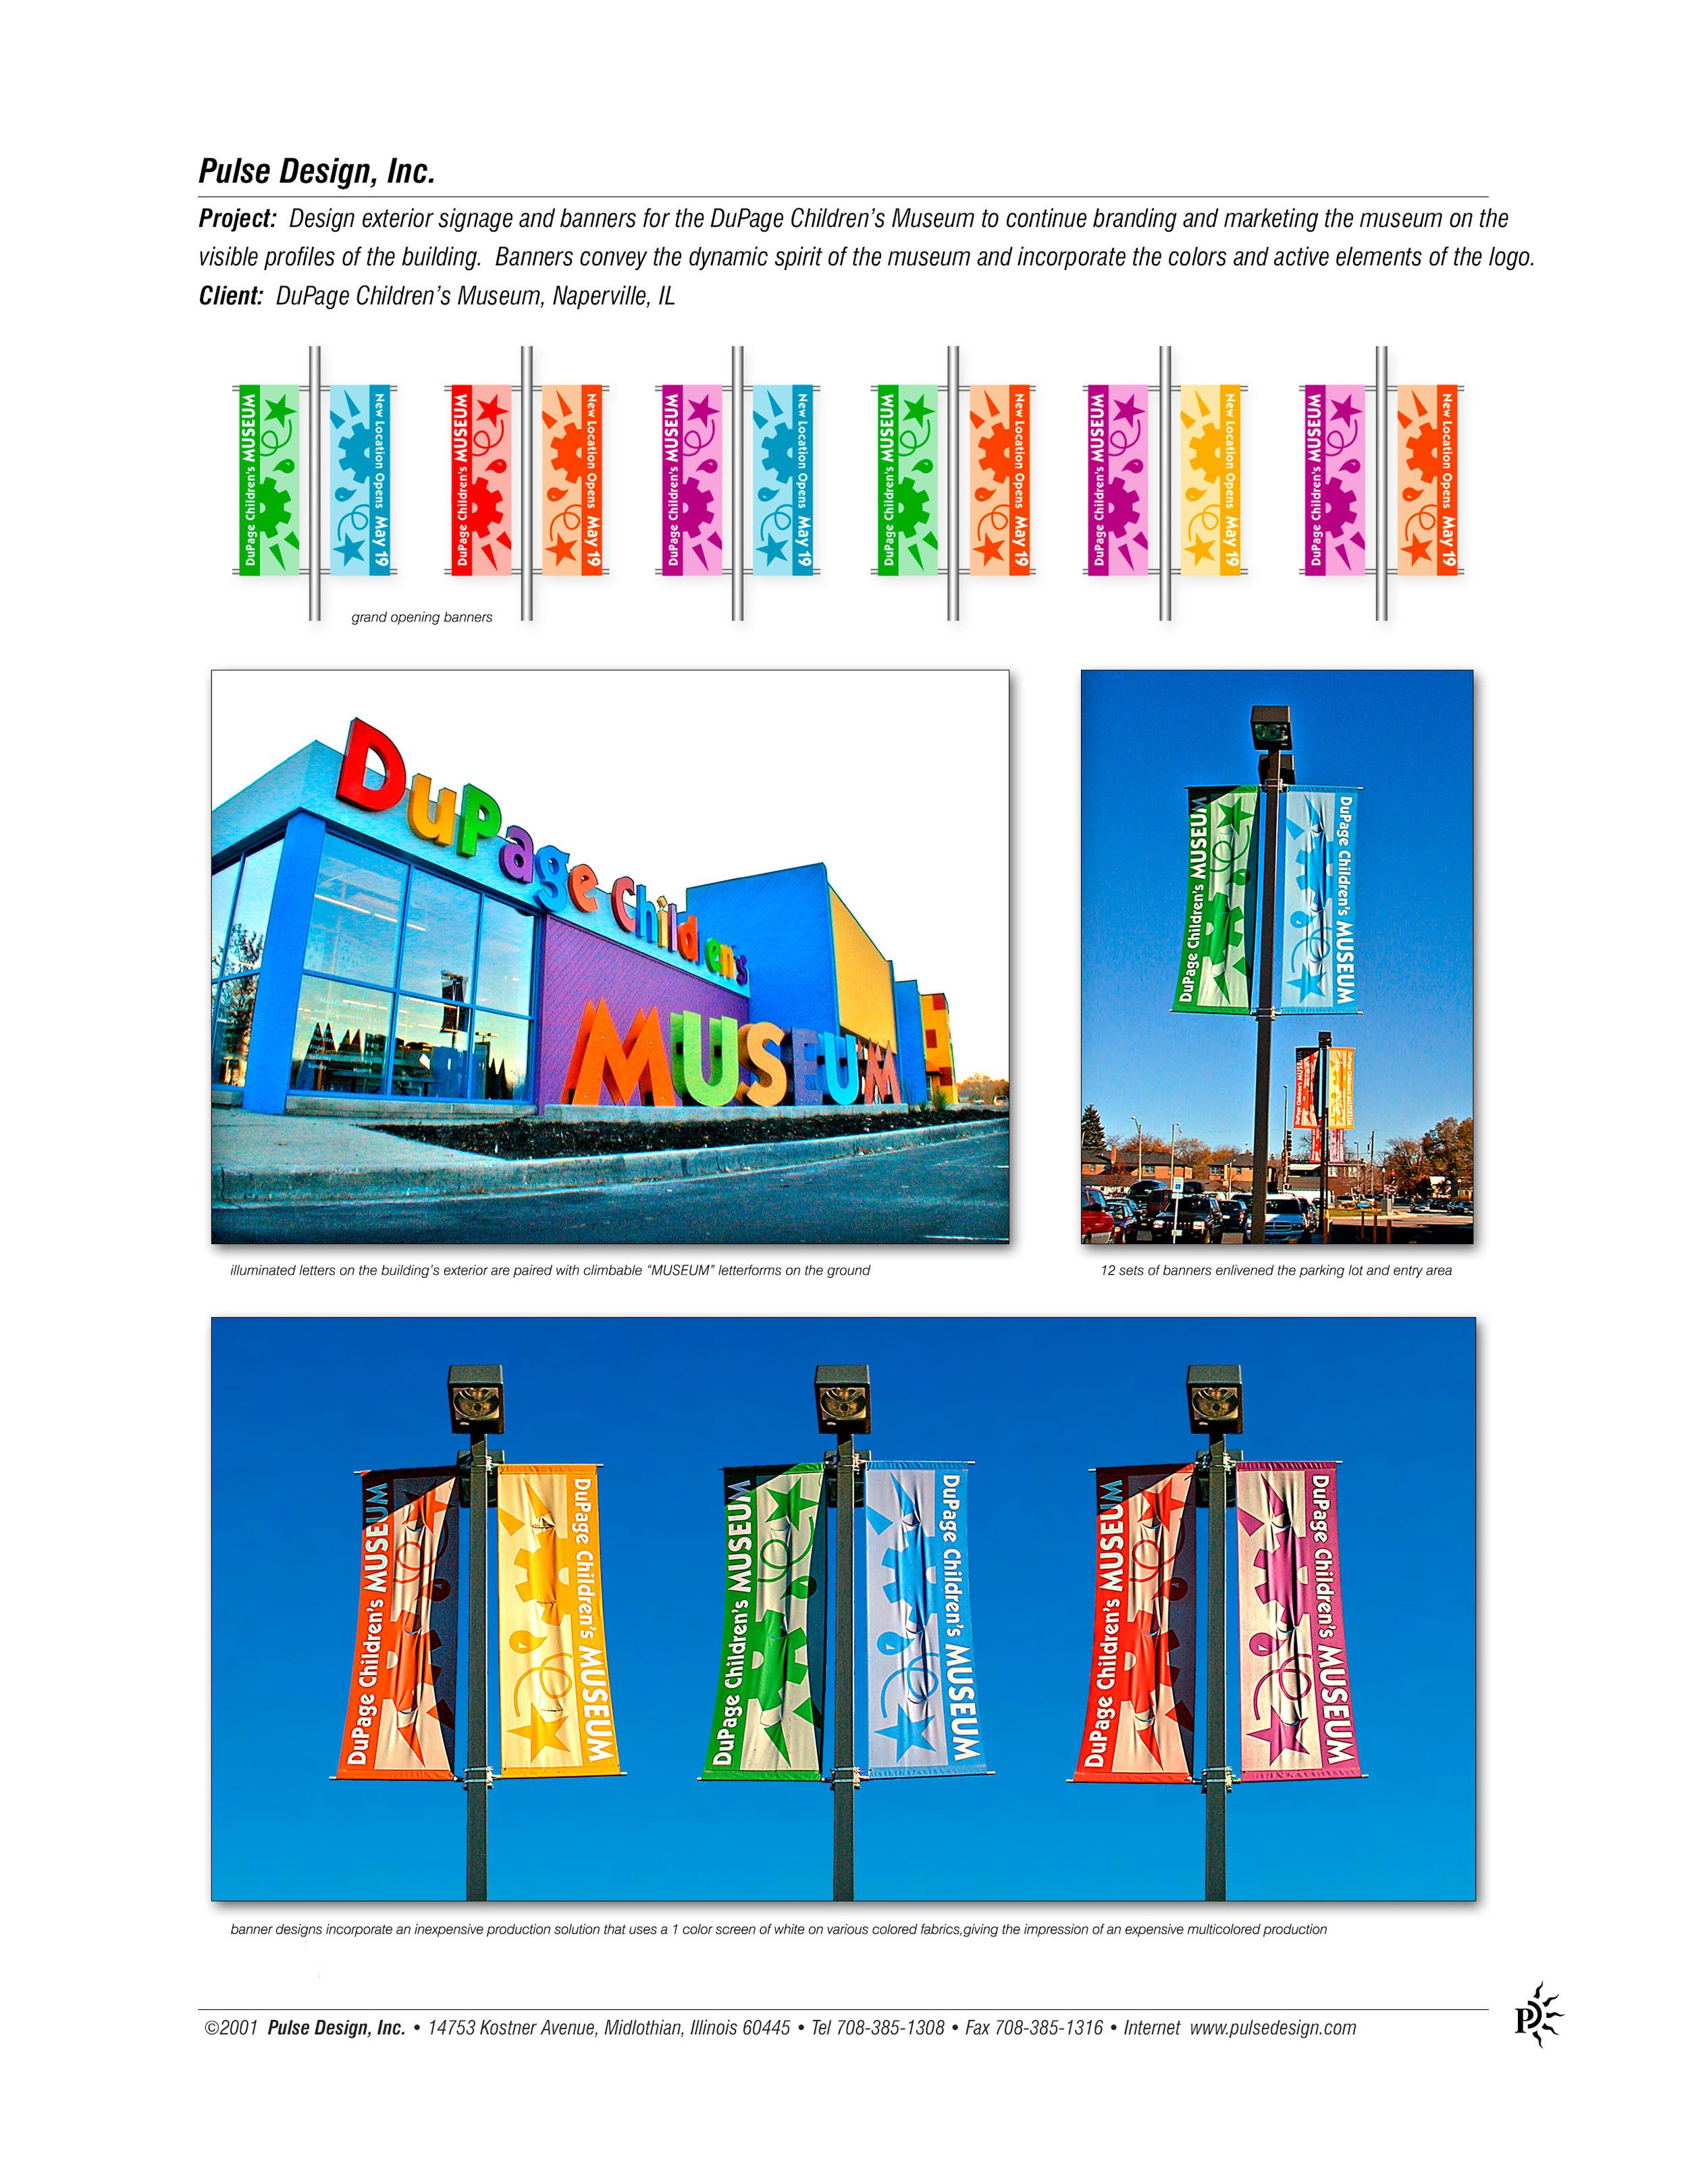 DCM-Banners-Exterior-Pulse-Design-Inc.jpg